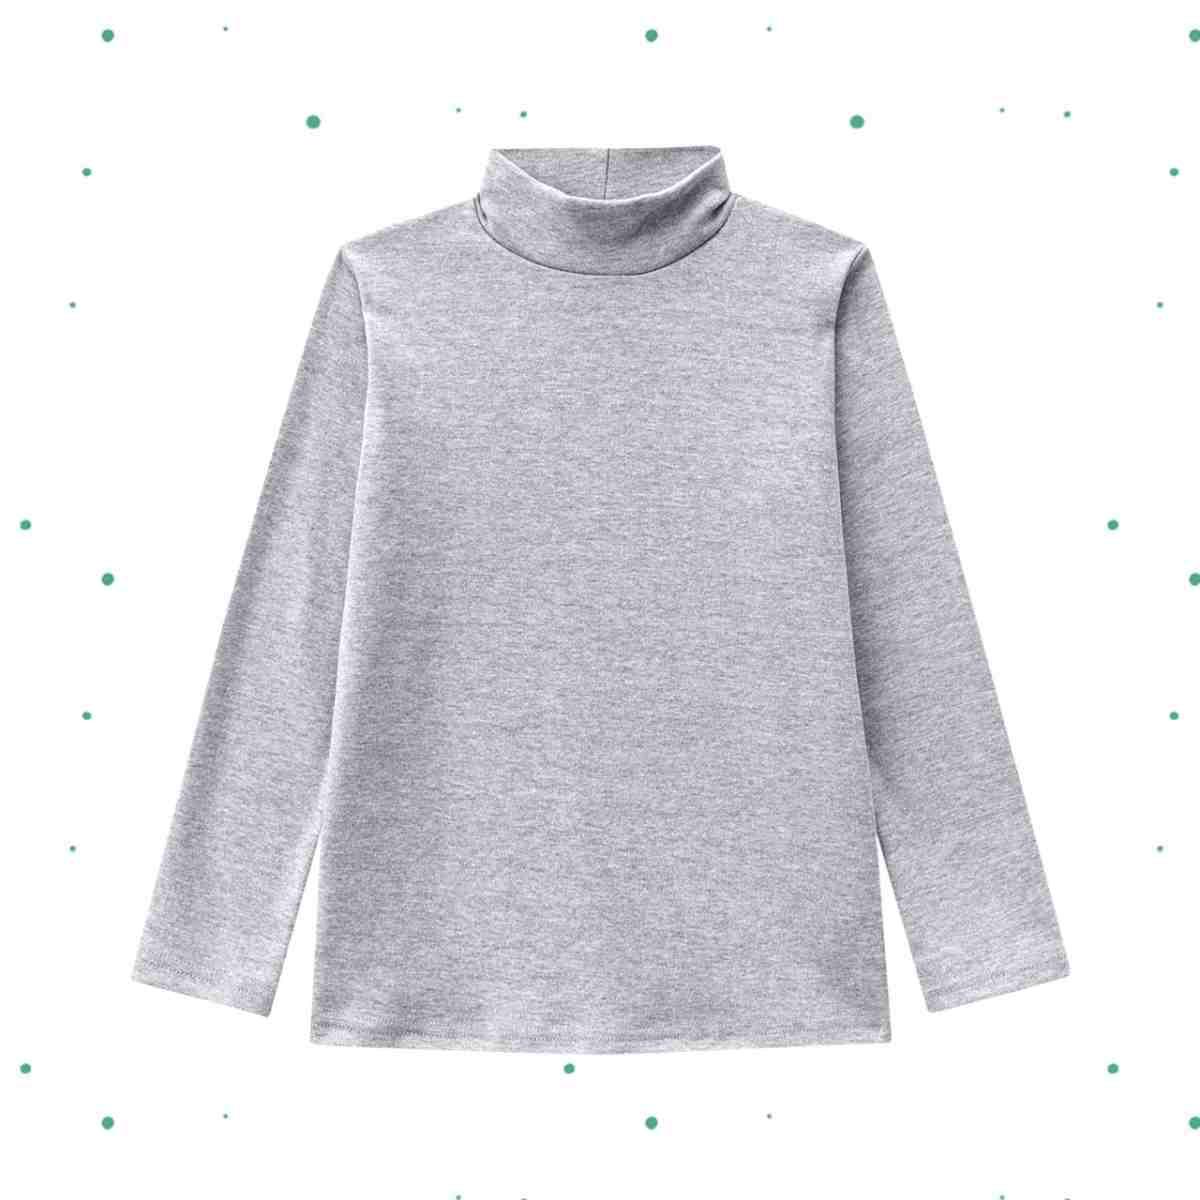 Camiseta Menino Manga Longa Kyly em Suedine com Gola Cacharrel